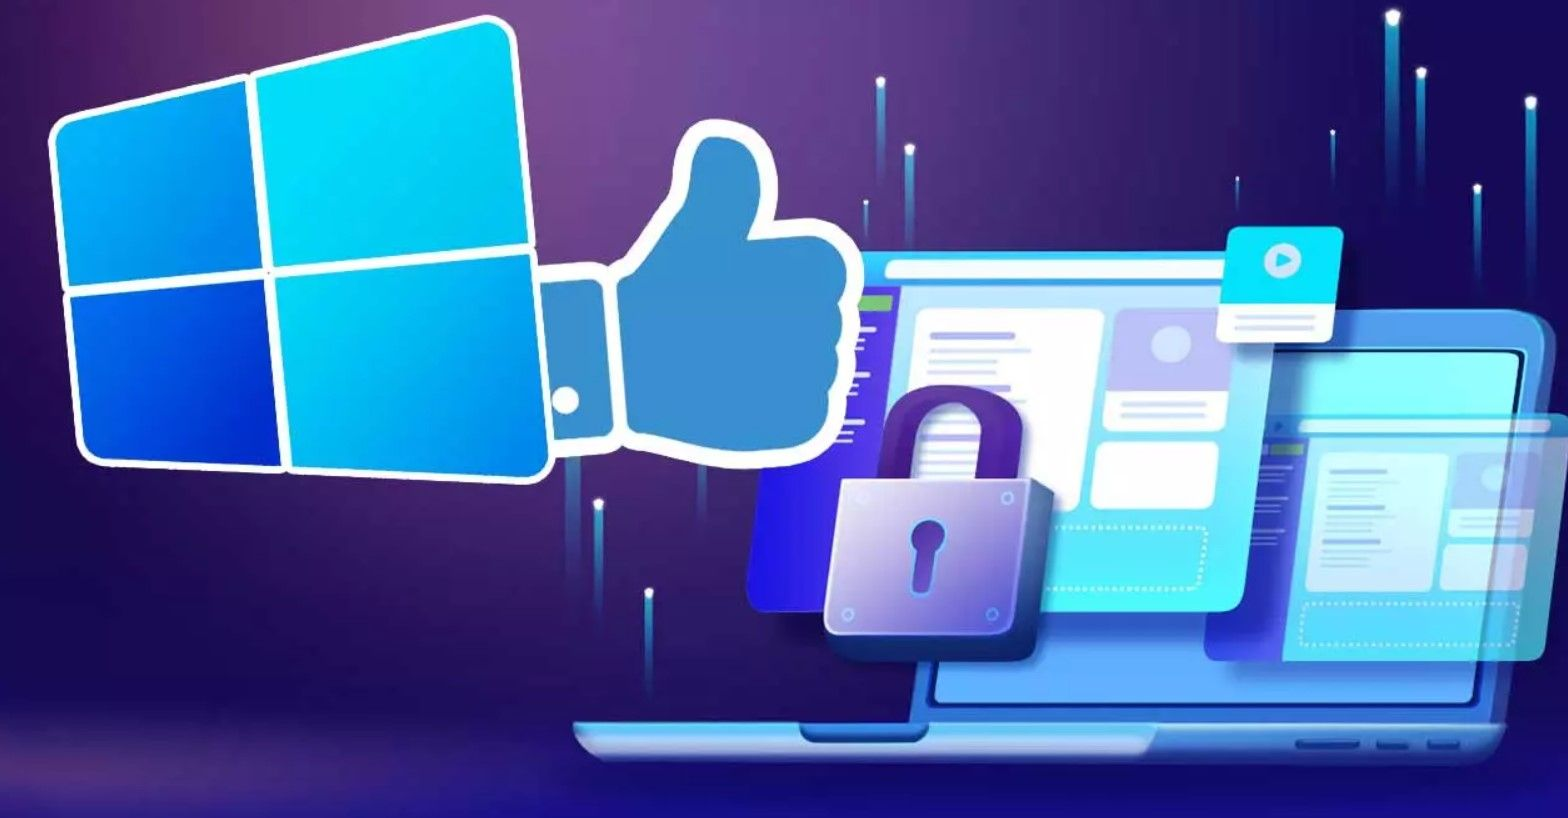 Programas antivirus compatibles Windows 11